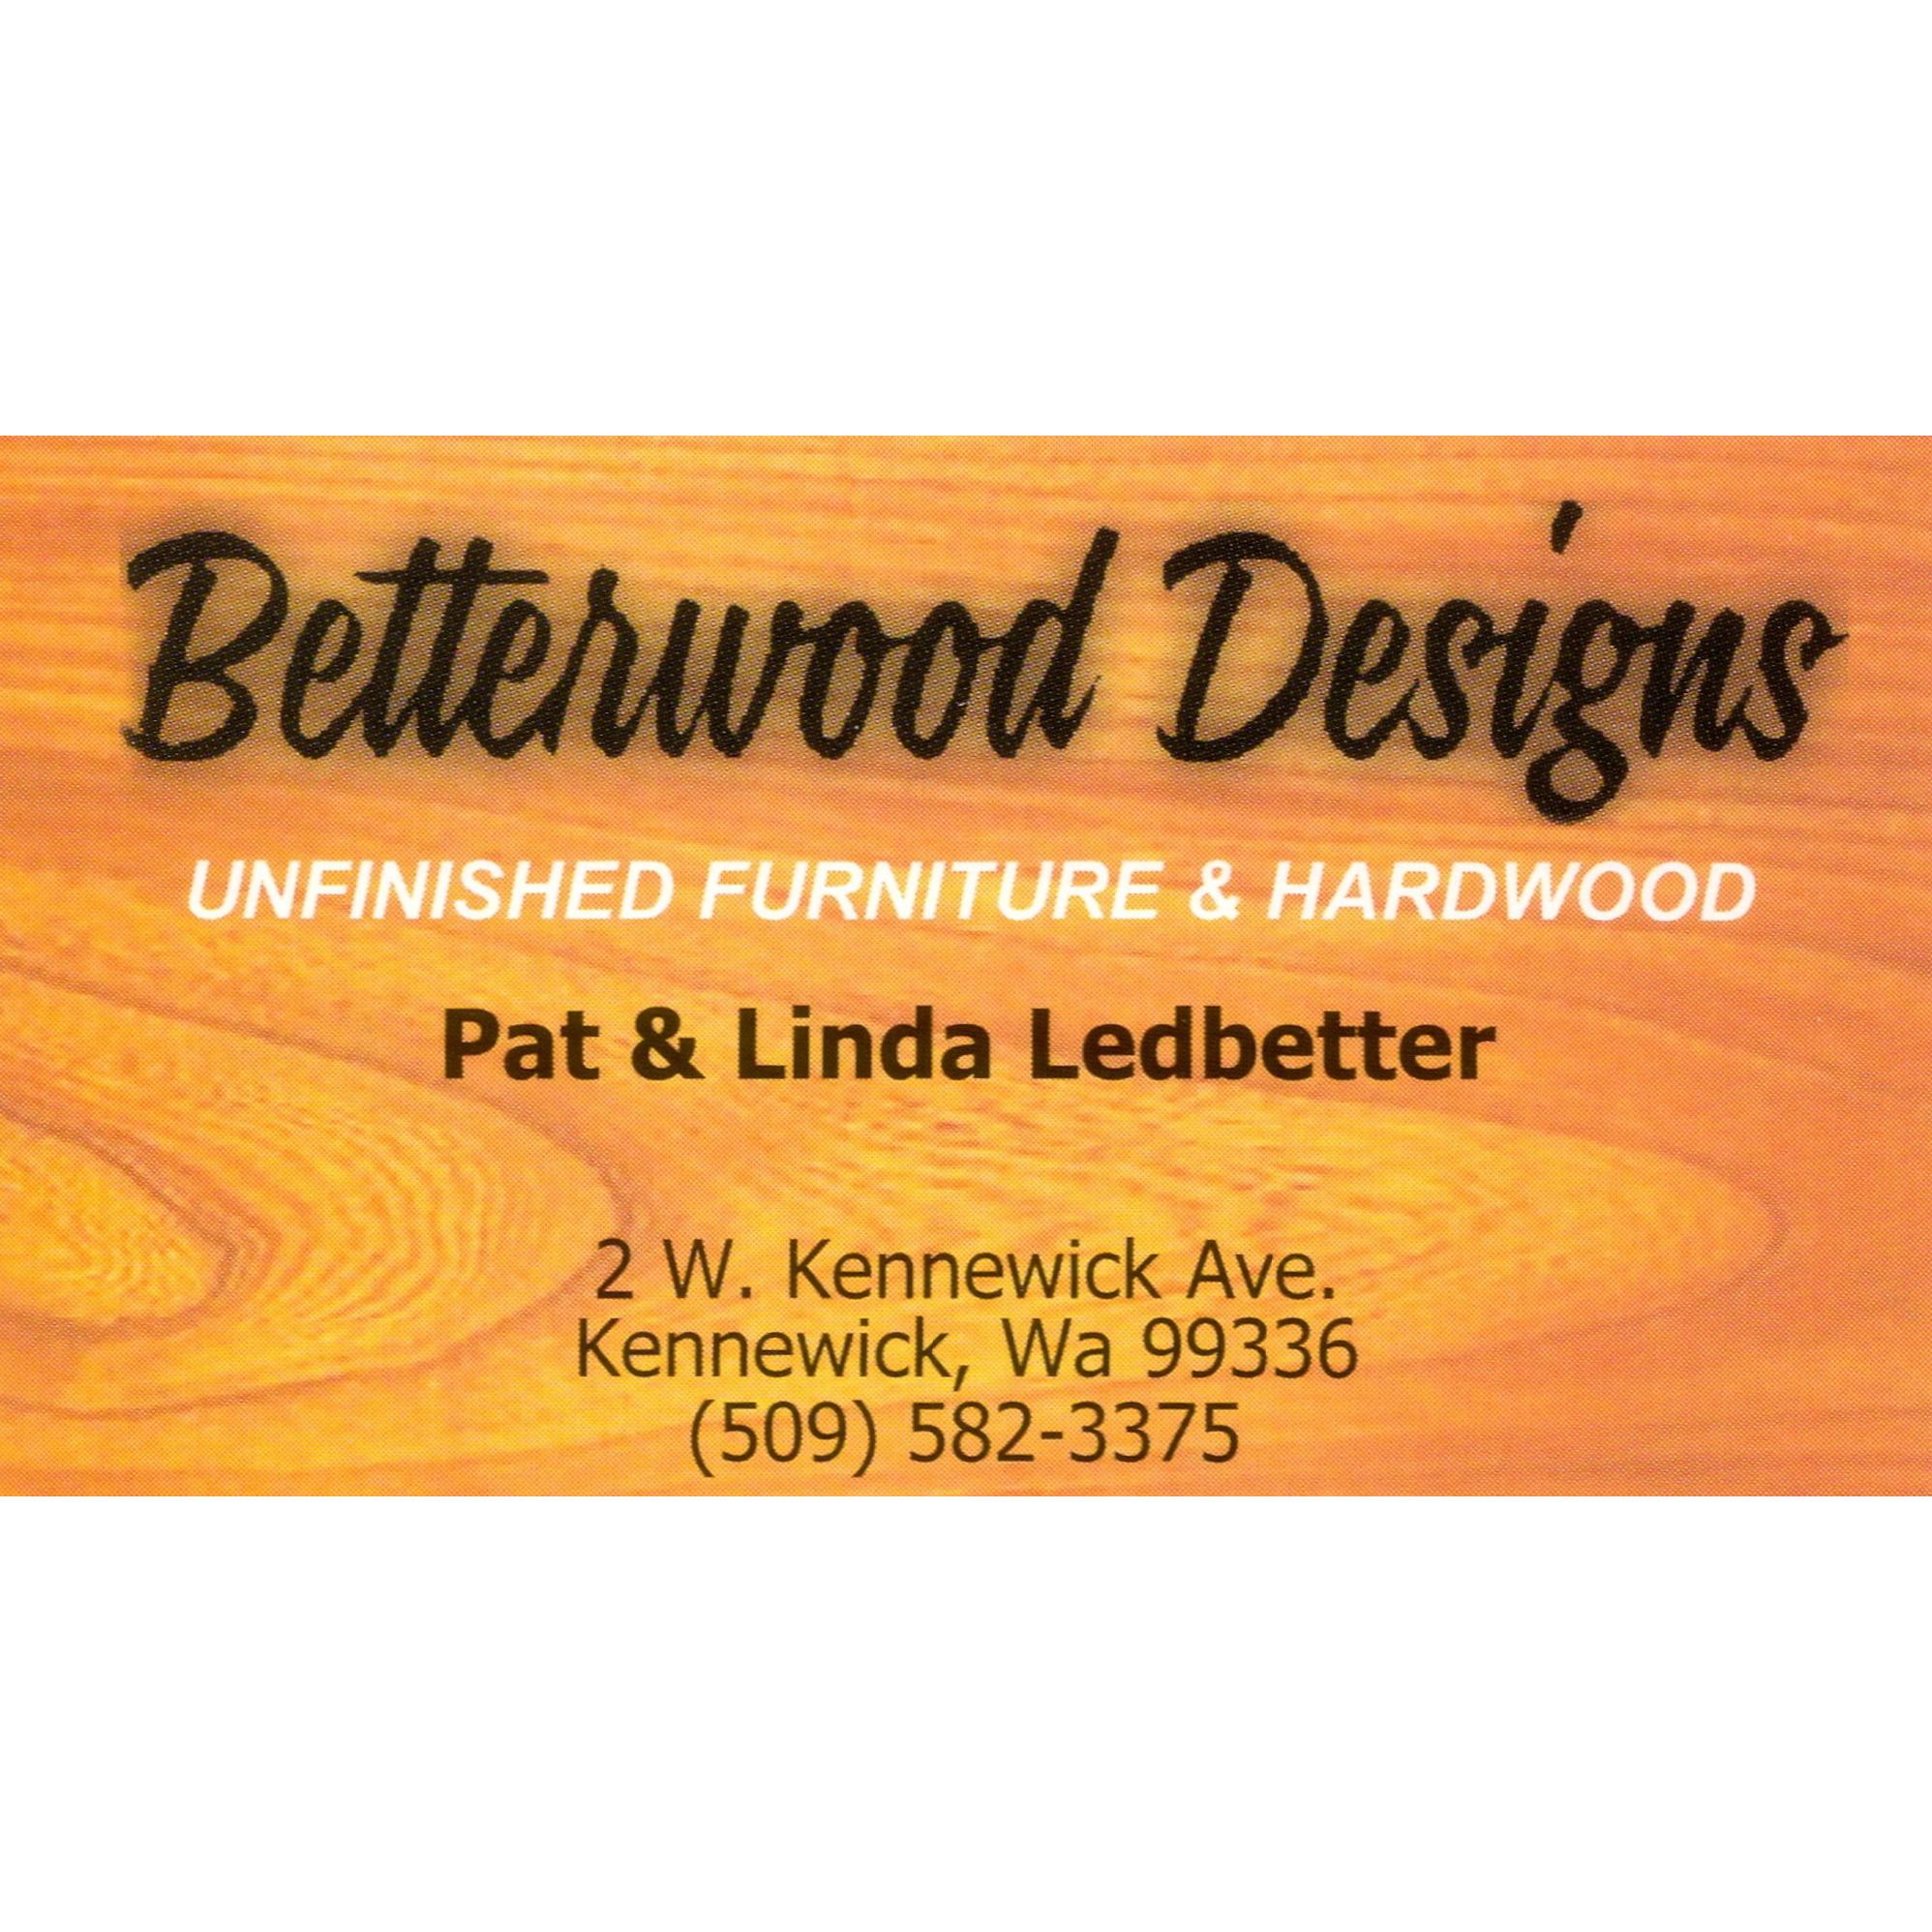 Betterwood Designs